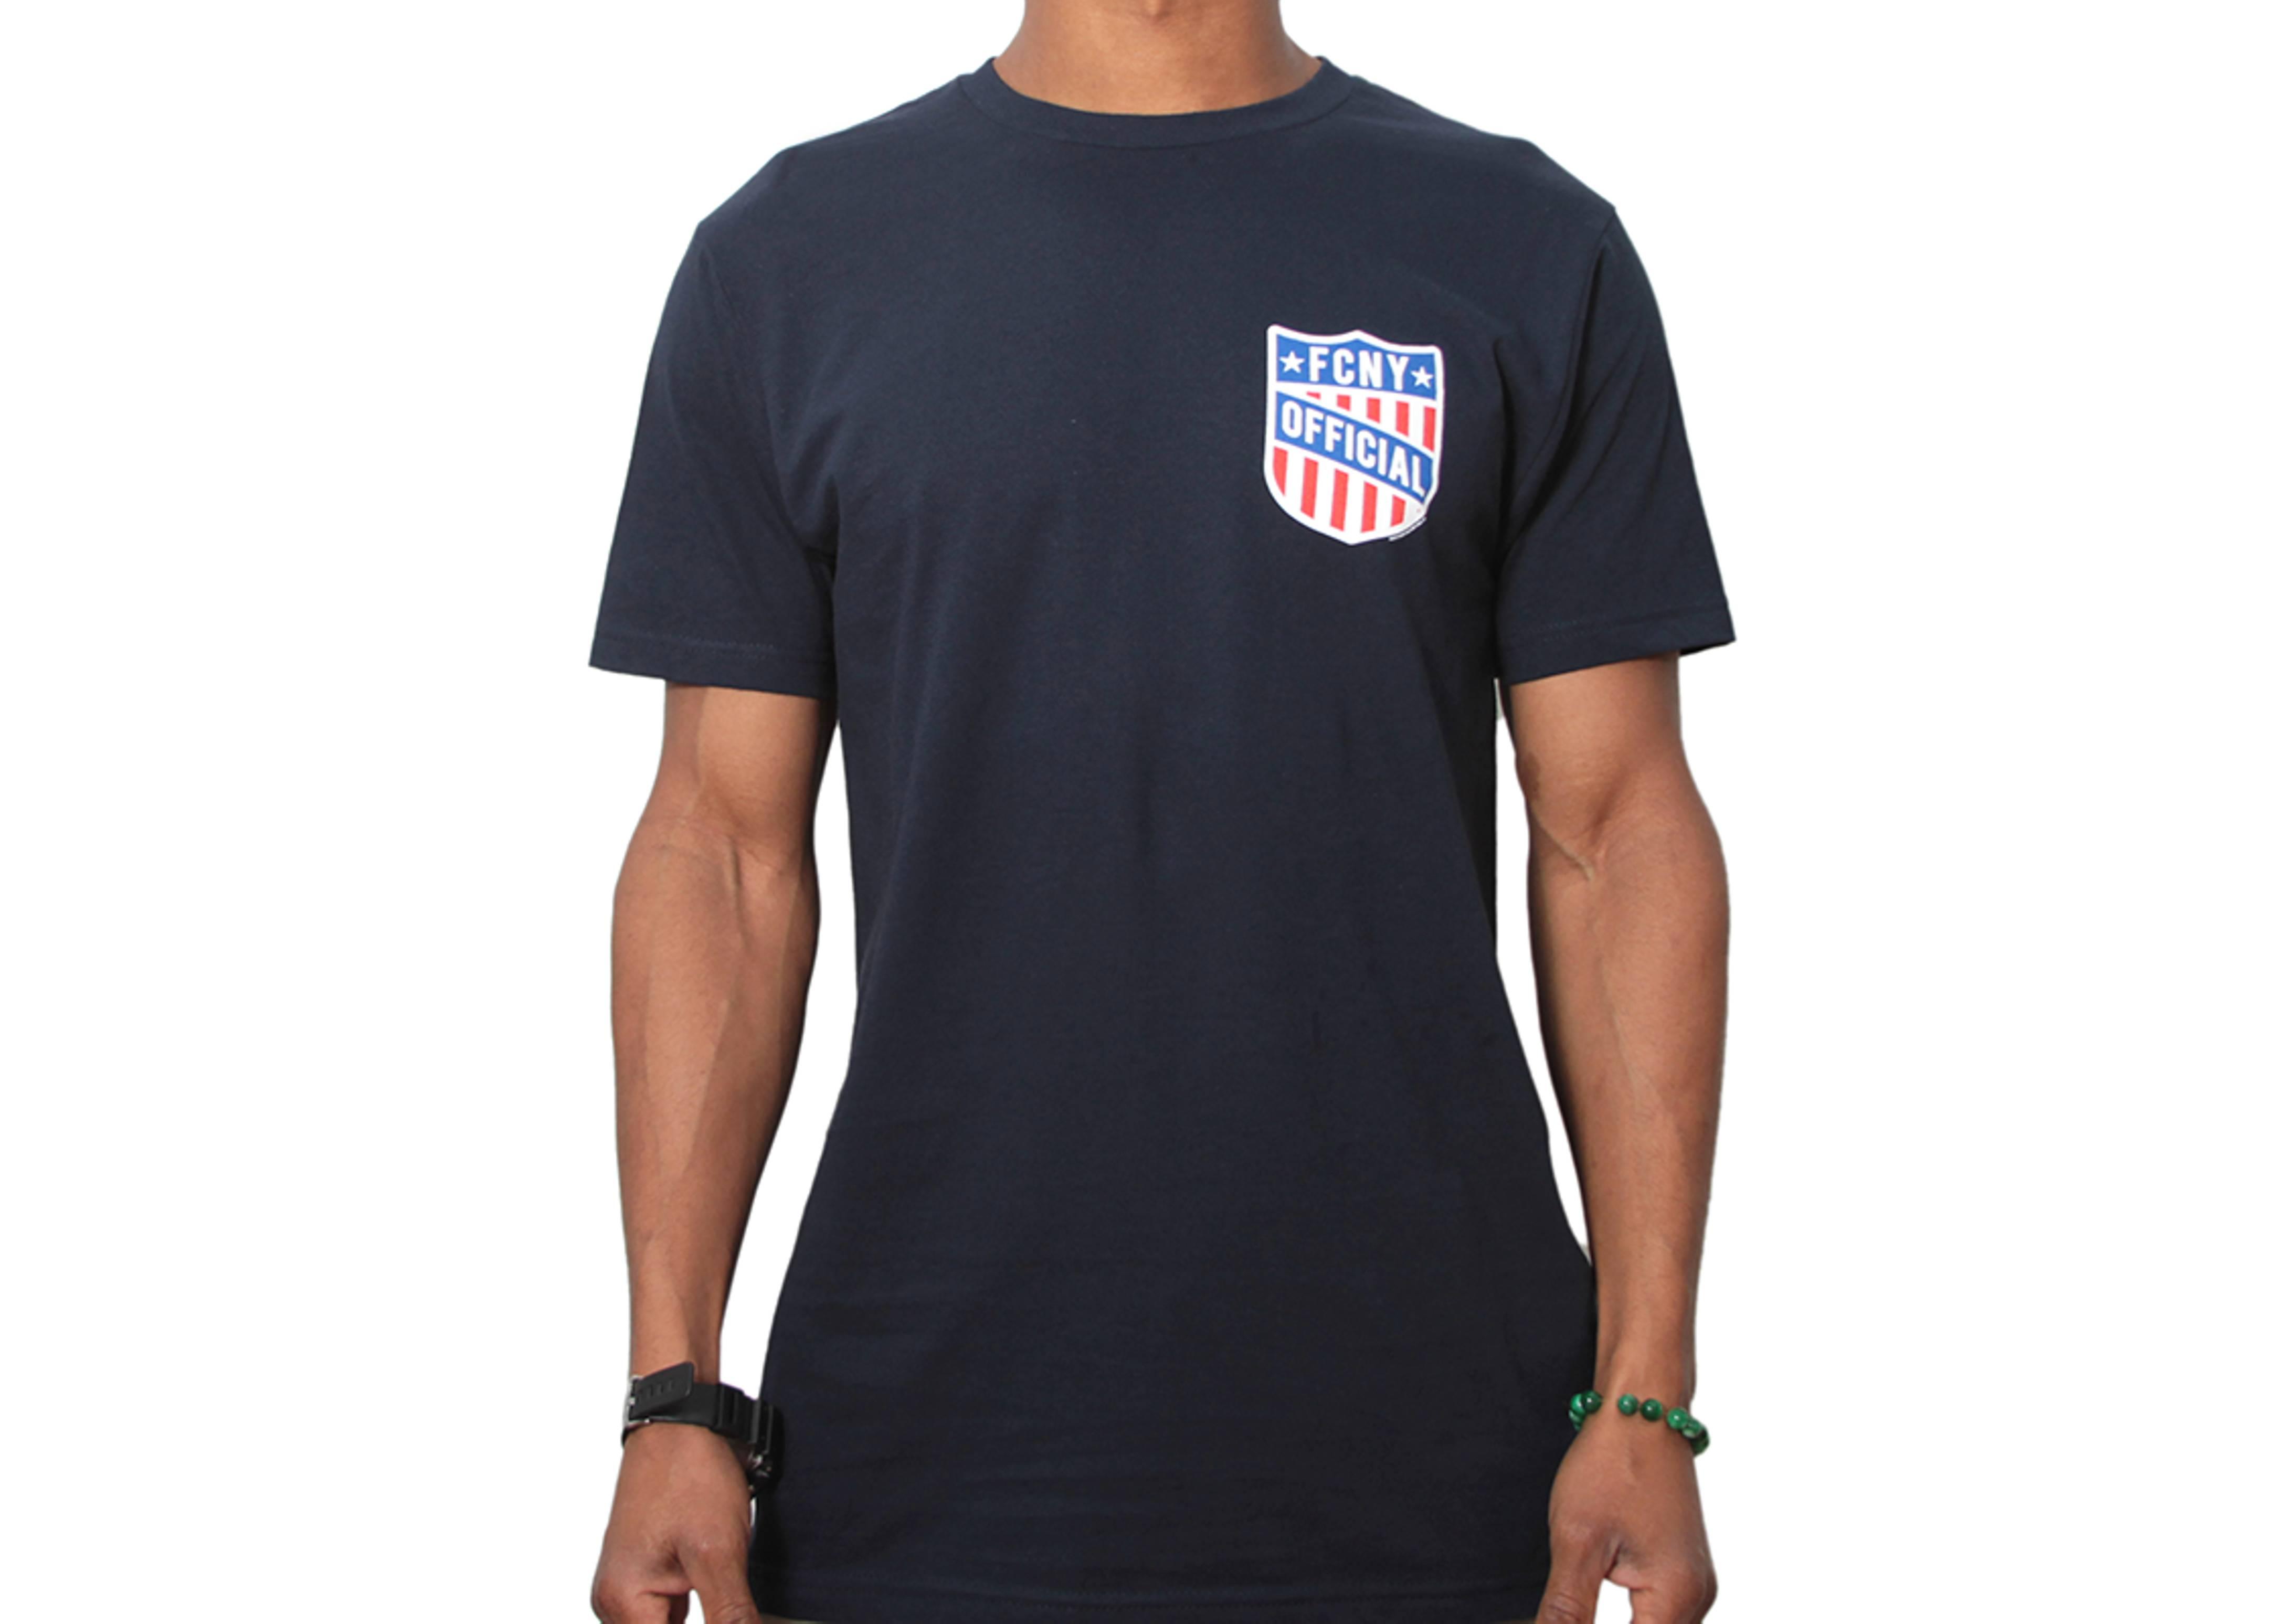 fcny shield t-shirt